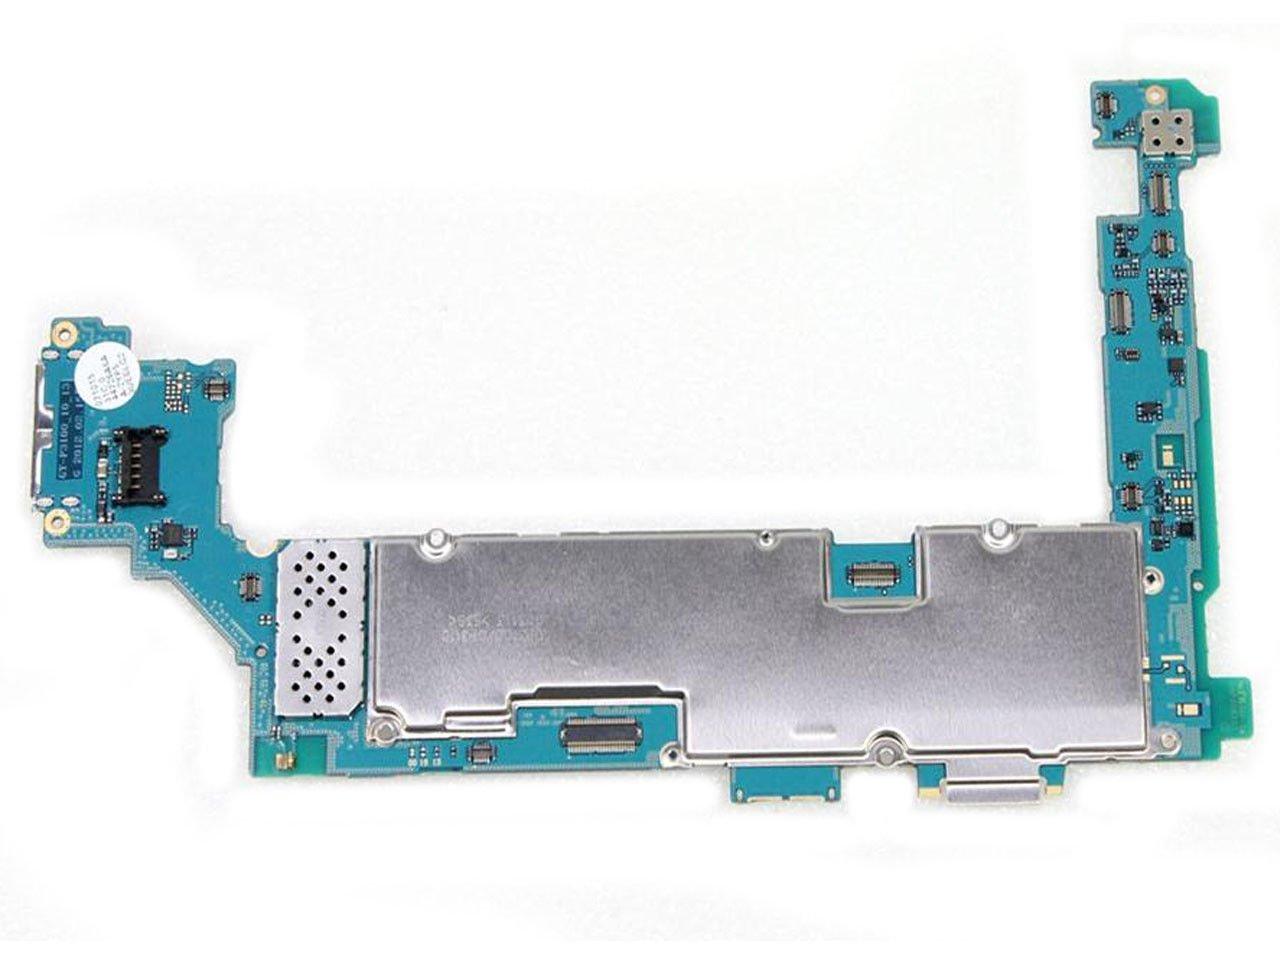 "Samsung Galaxy Tab 2 GT-P3100 GT-P3113 7"" Tablet Motherboard GH82-06478A"